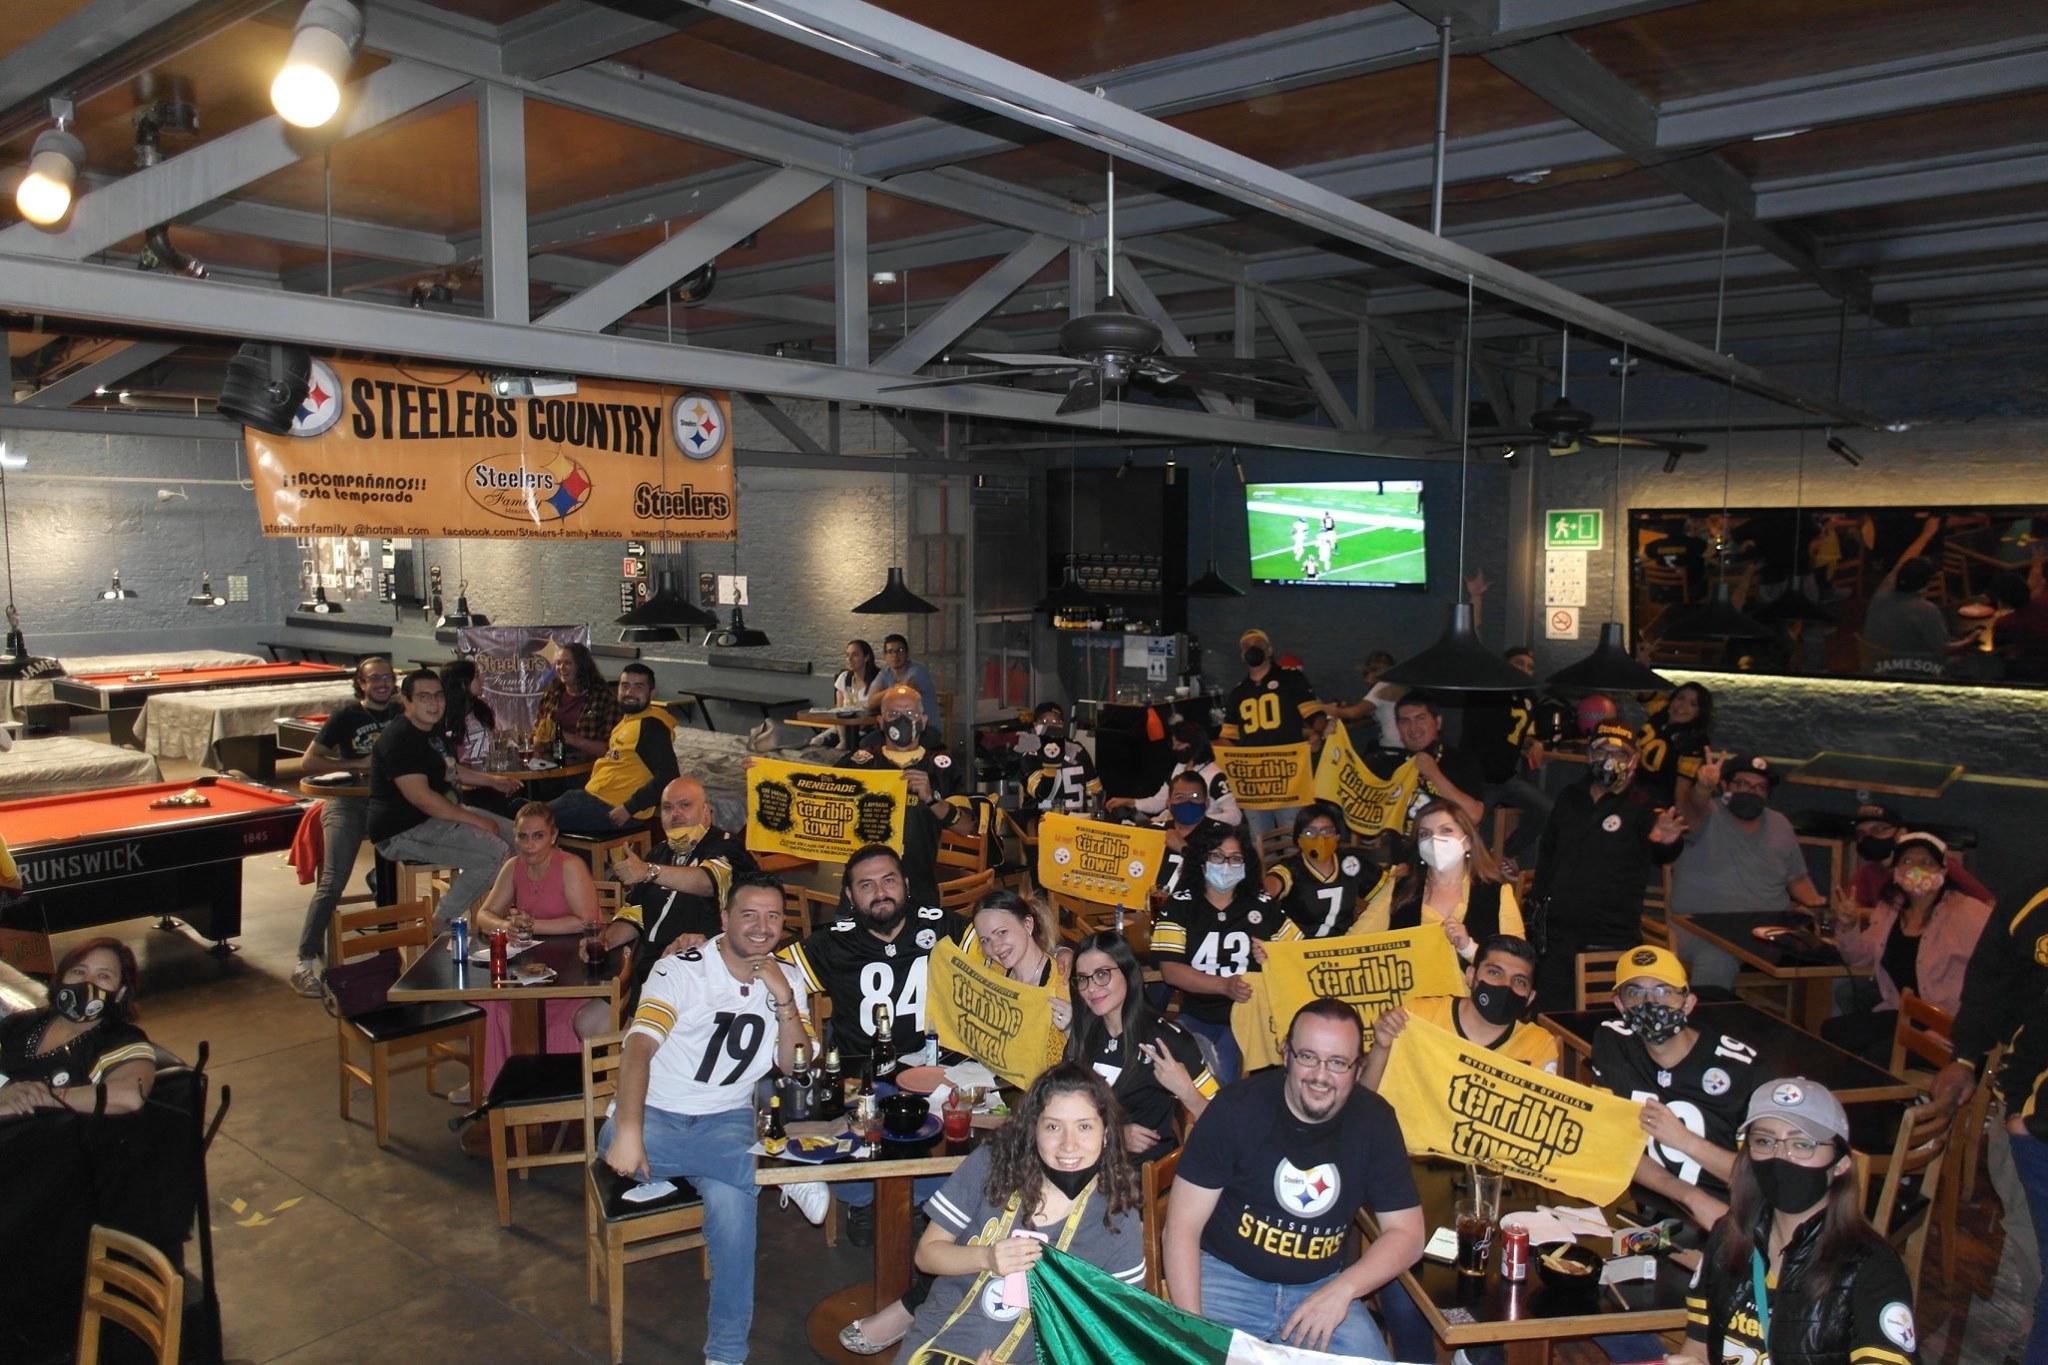 Steelers 2